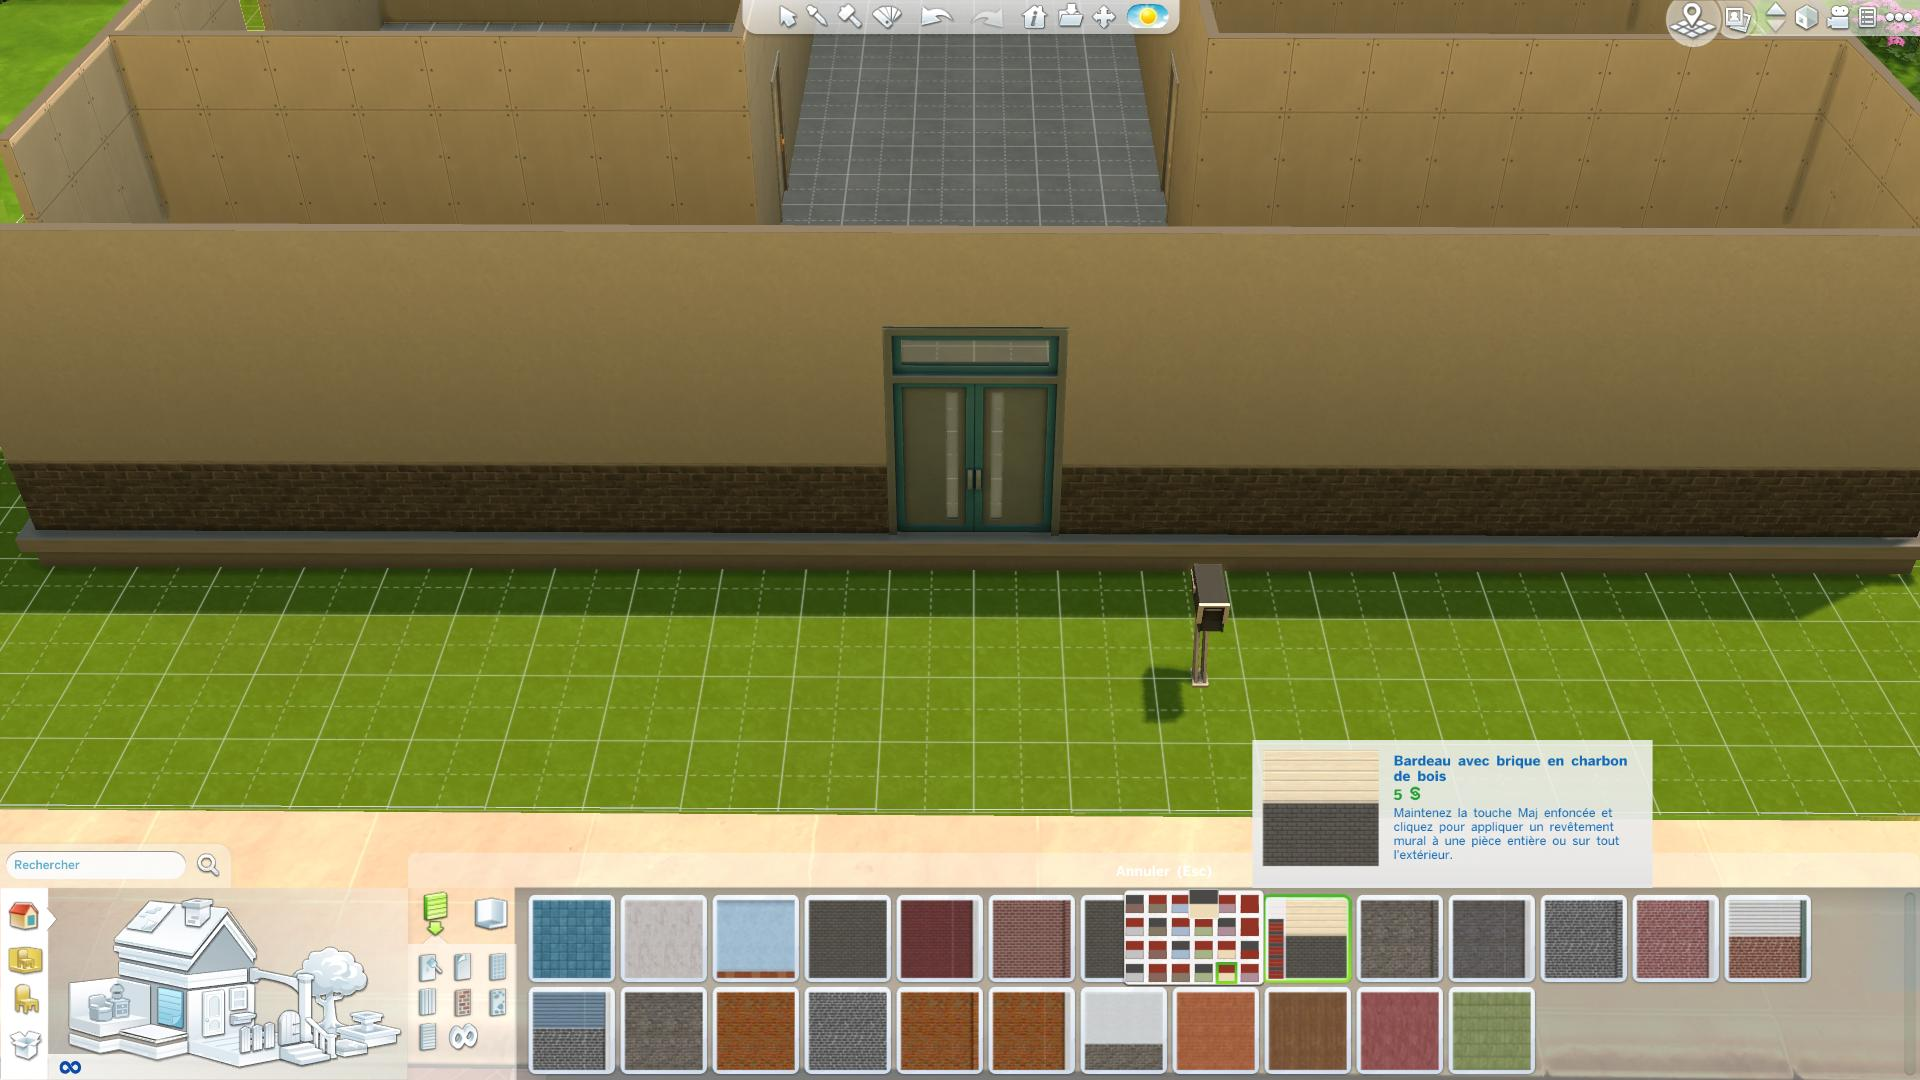 Les sims 4 construire sa maison 2 game guide for Exterieur sims 4